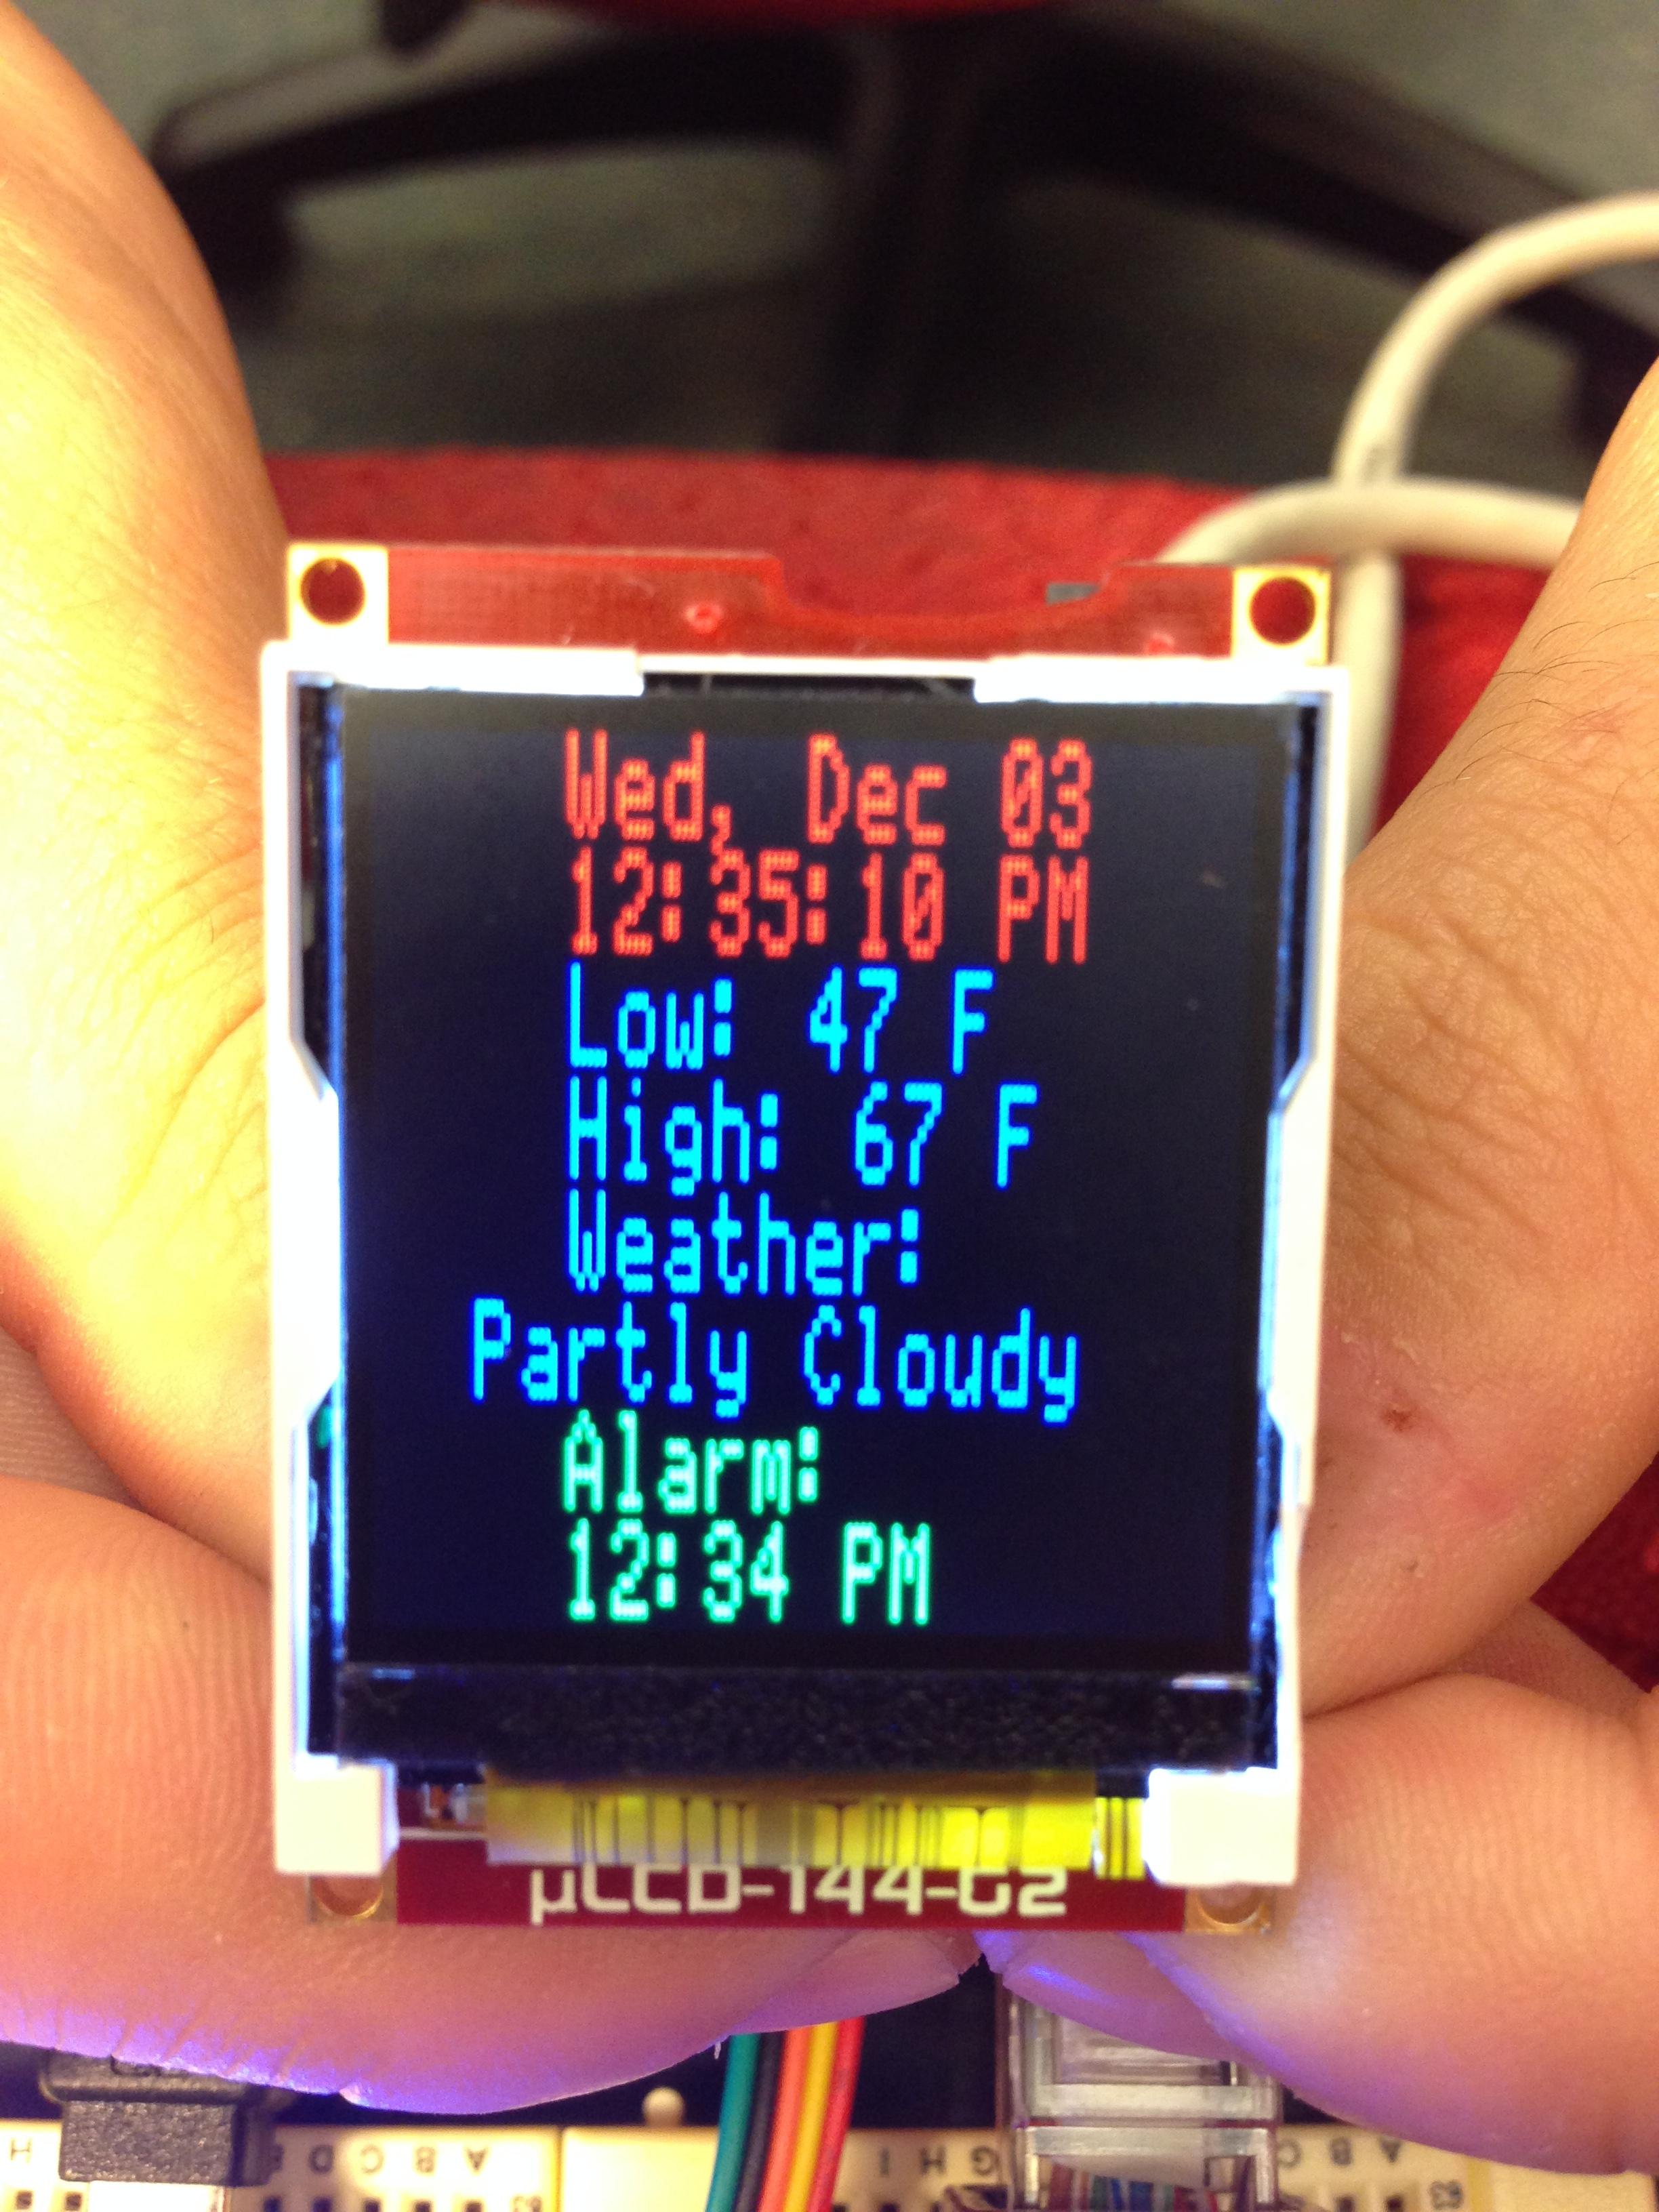 Iot Mbed Smart Alarm Clock Http Wwwschematicdiagramcom Electronicdigitalclockhtml Display